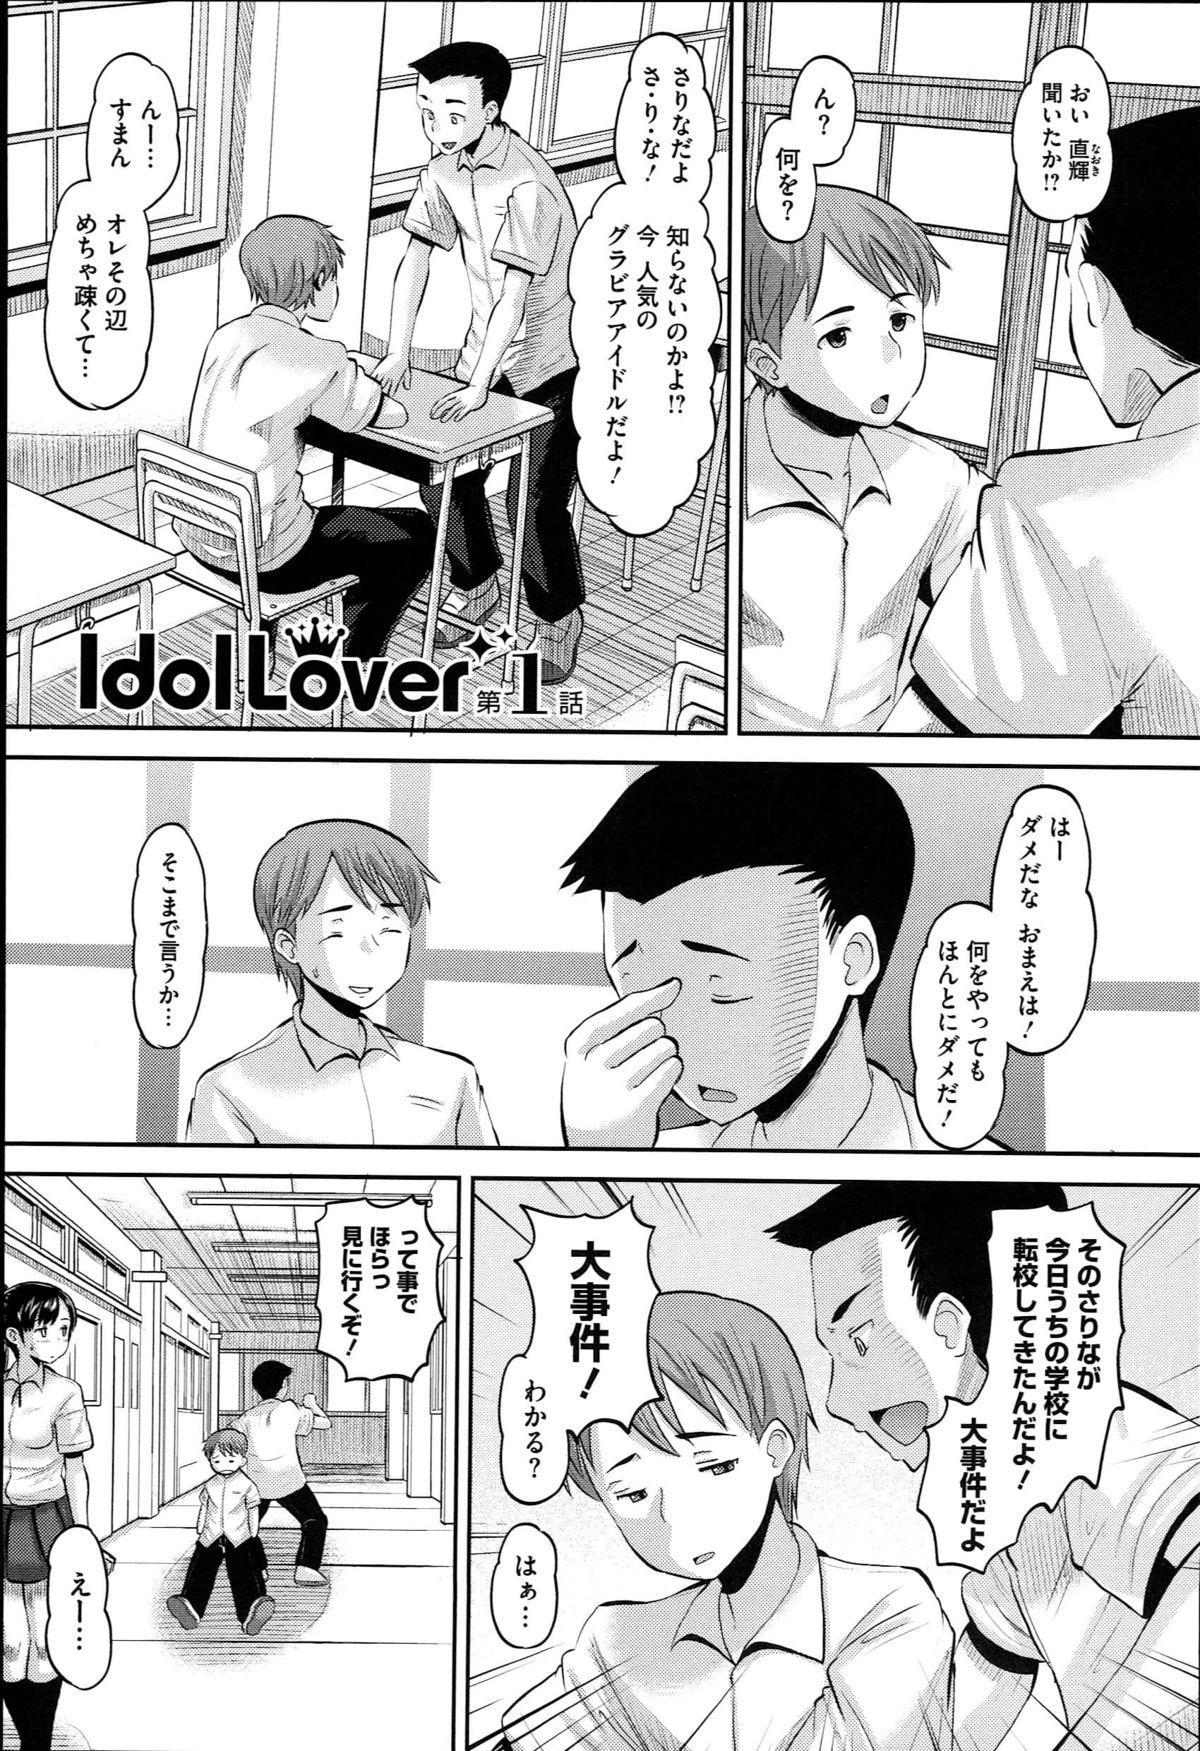 Idol Lover 6